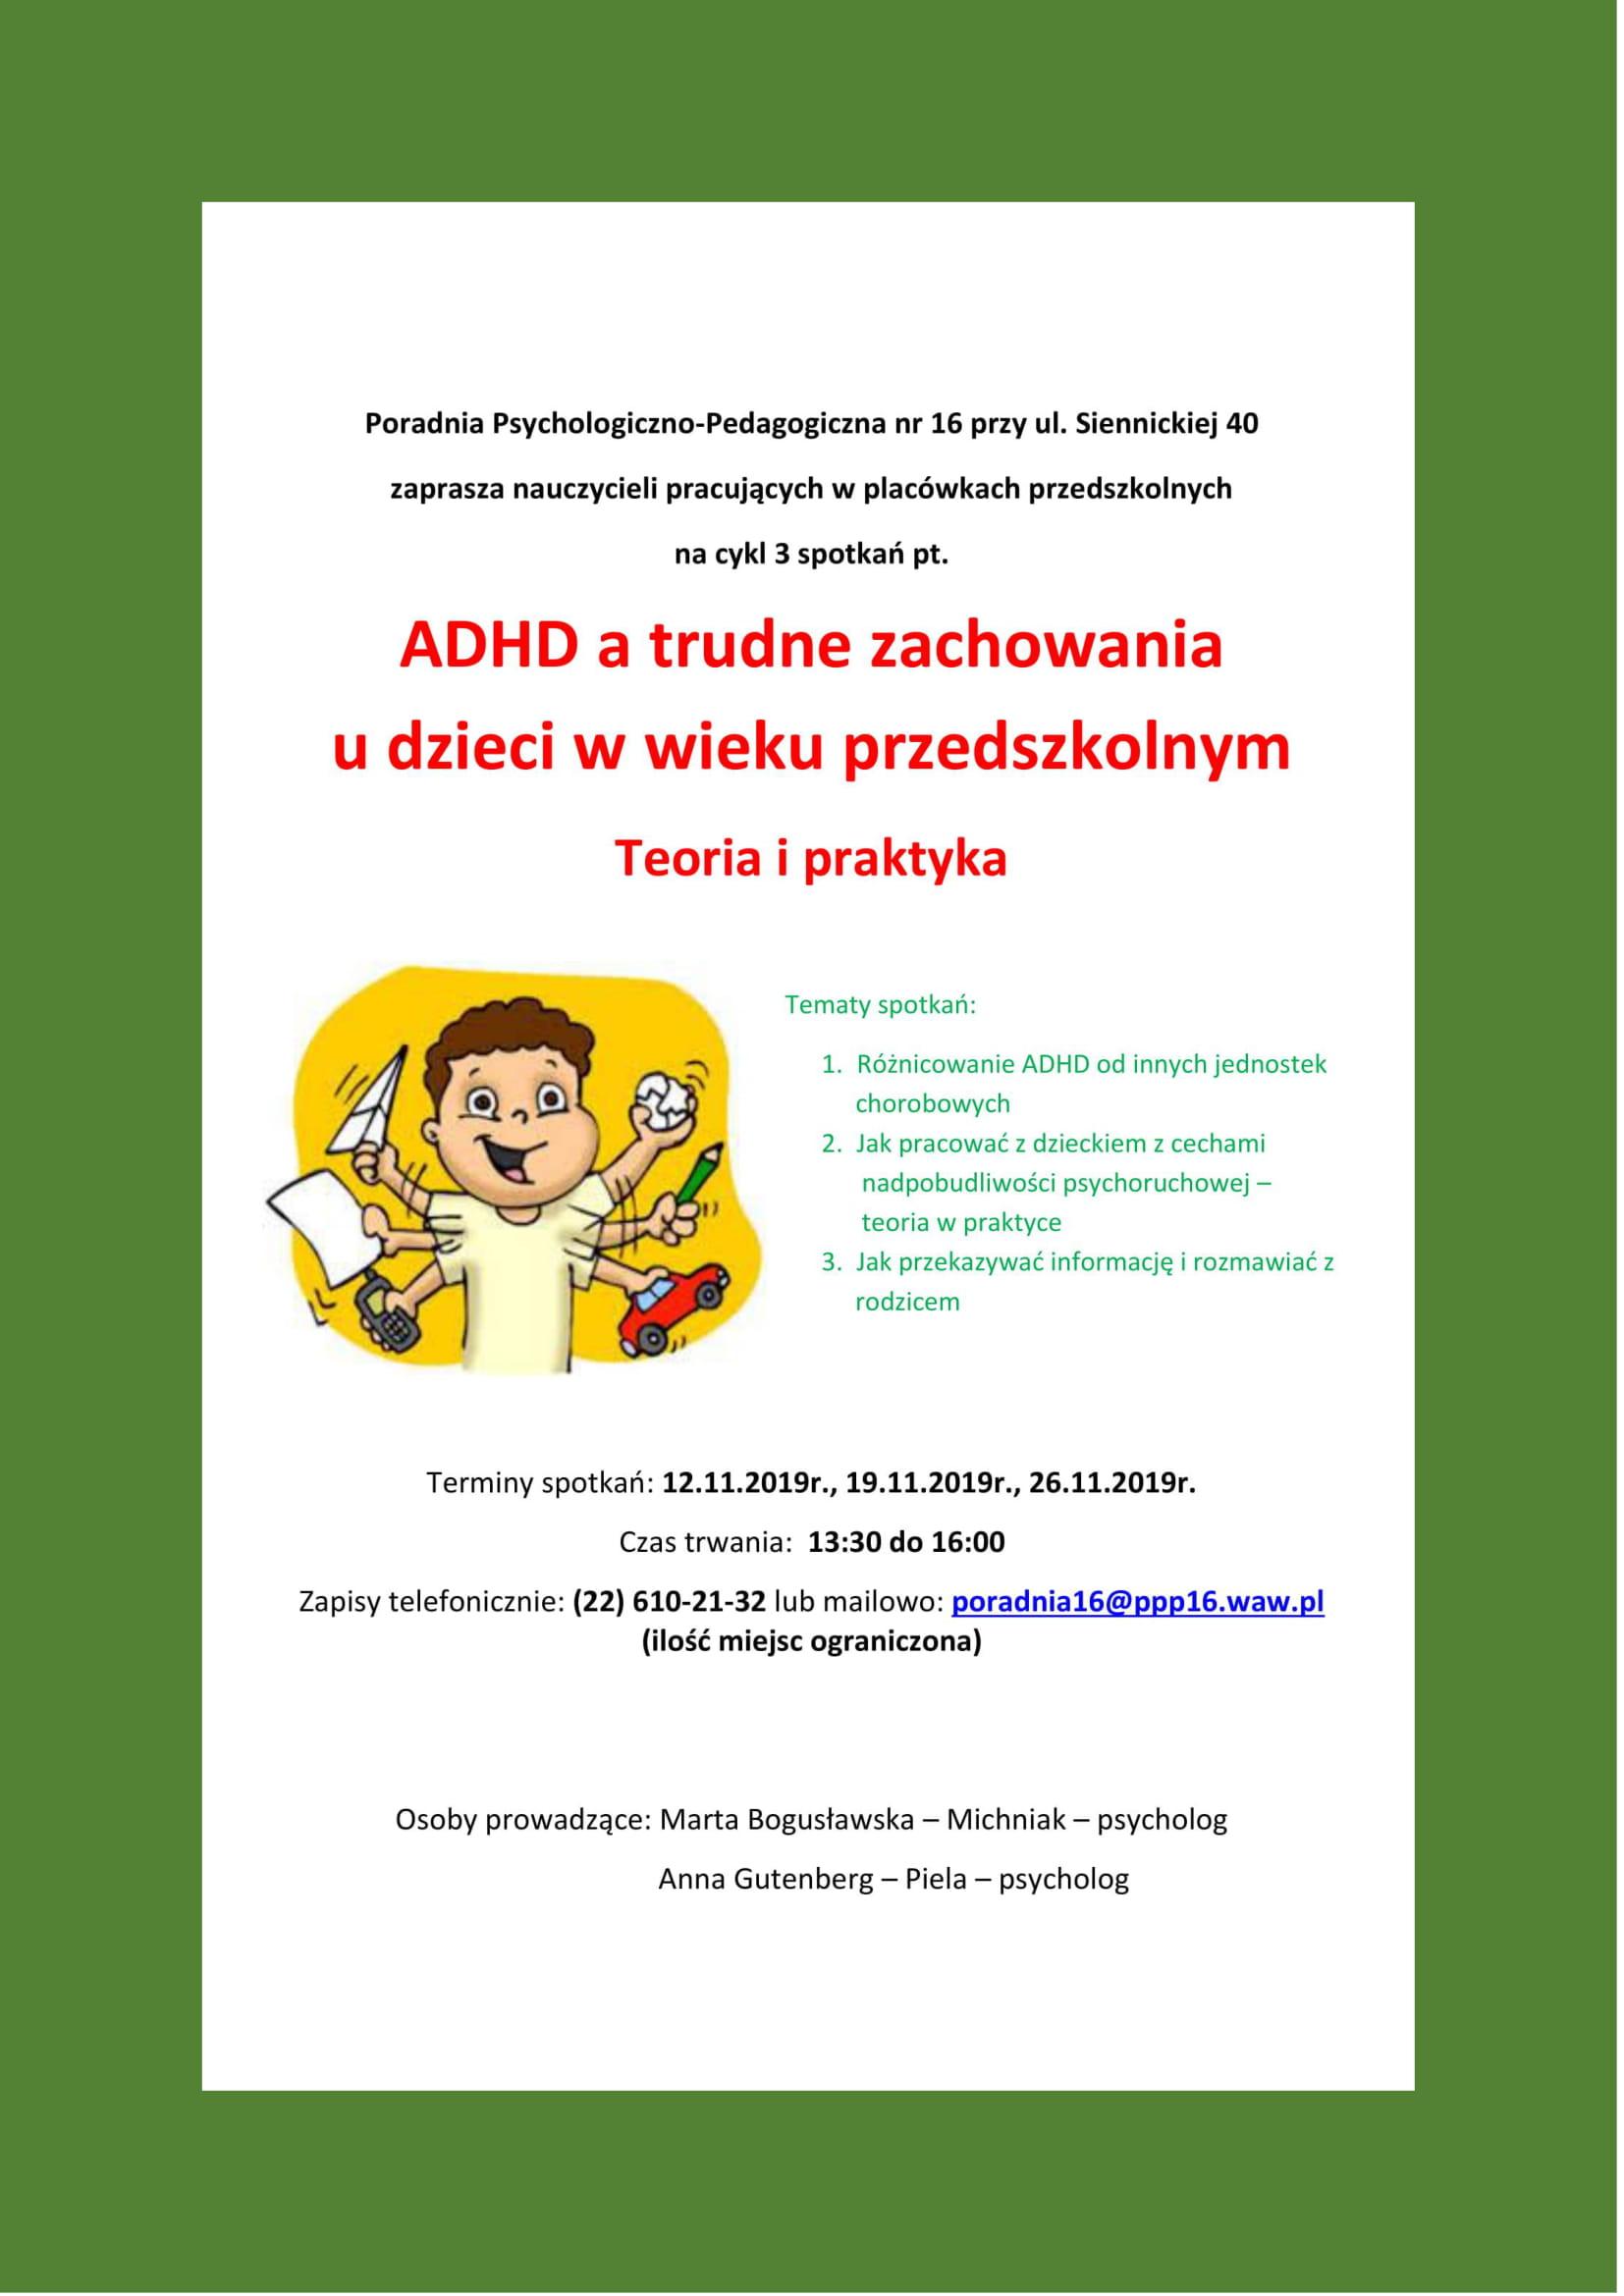 Plakat ADHD a trudne zachowania